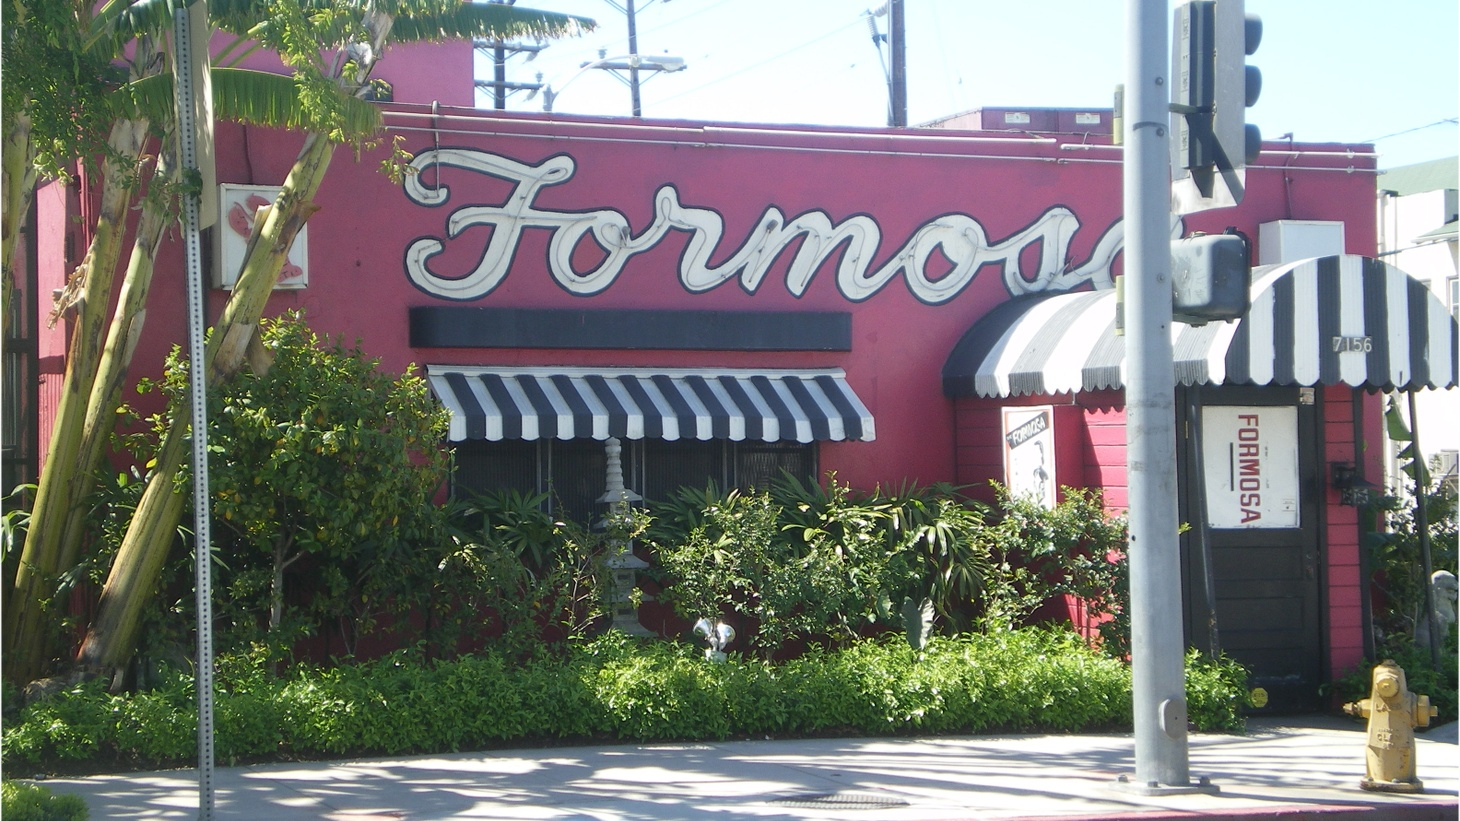 The Formosa Cafe on Santa Monica Boulevard.